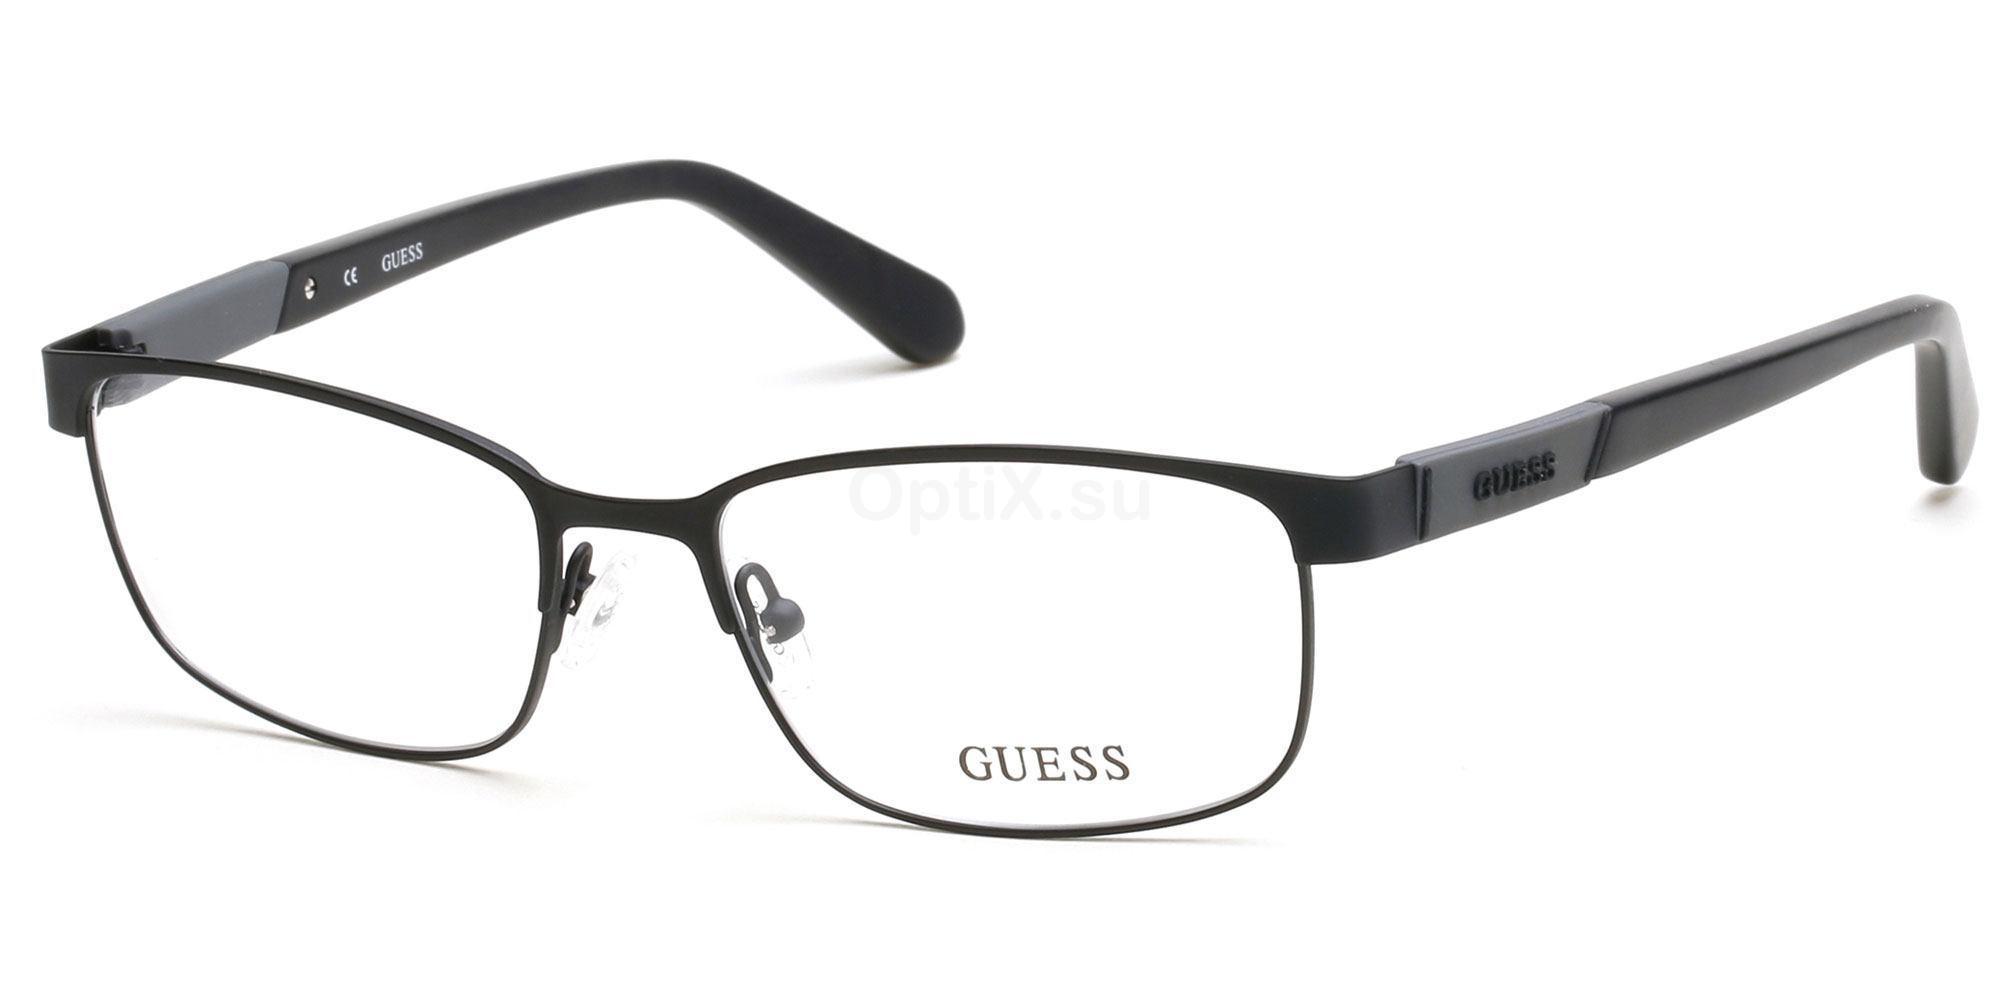 002 GU1865 , Guess